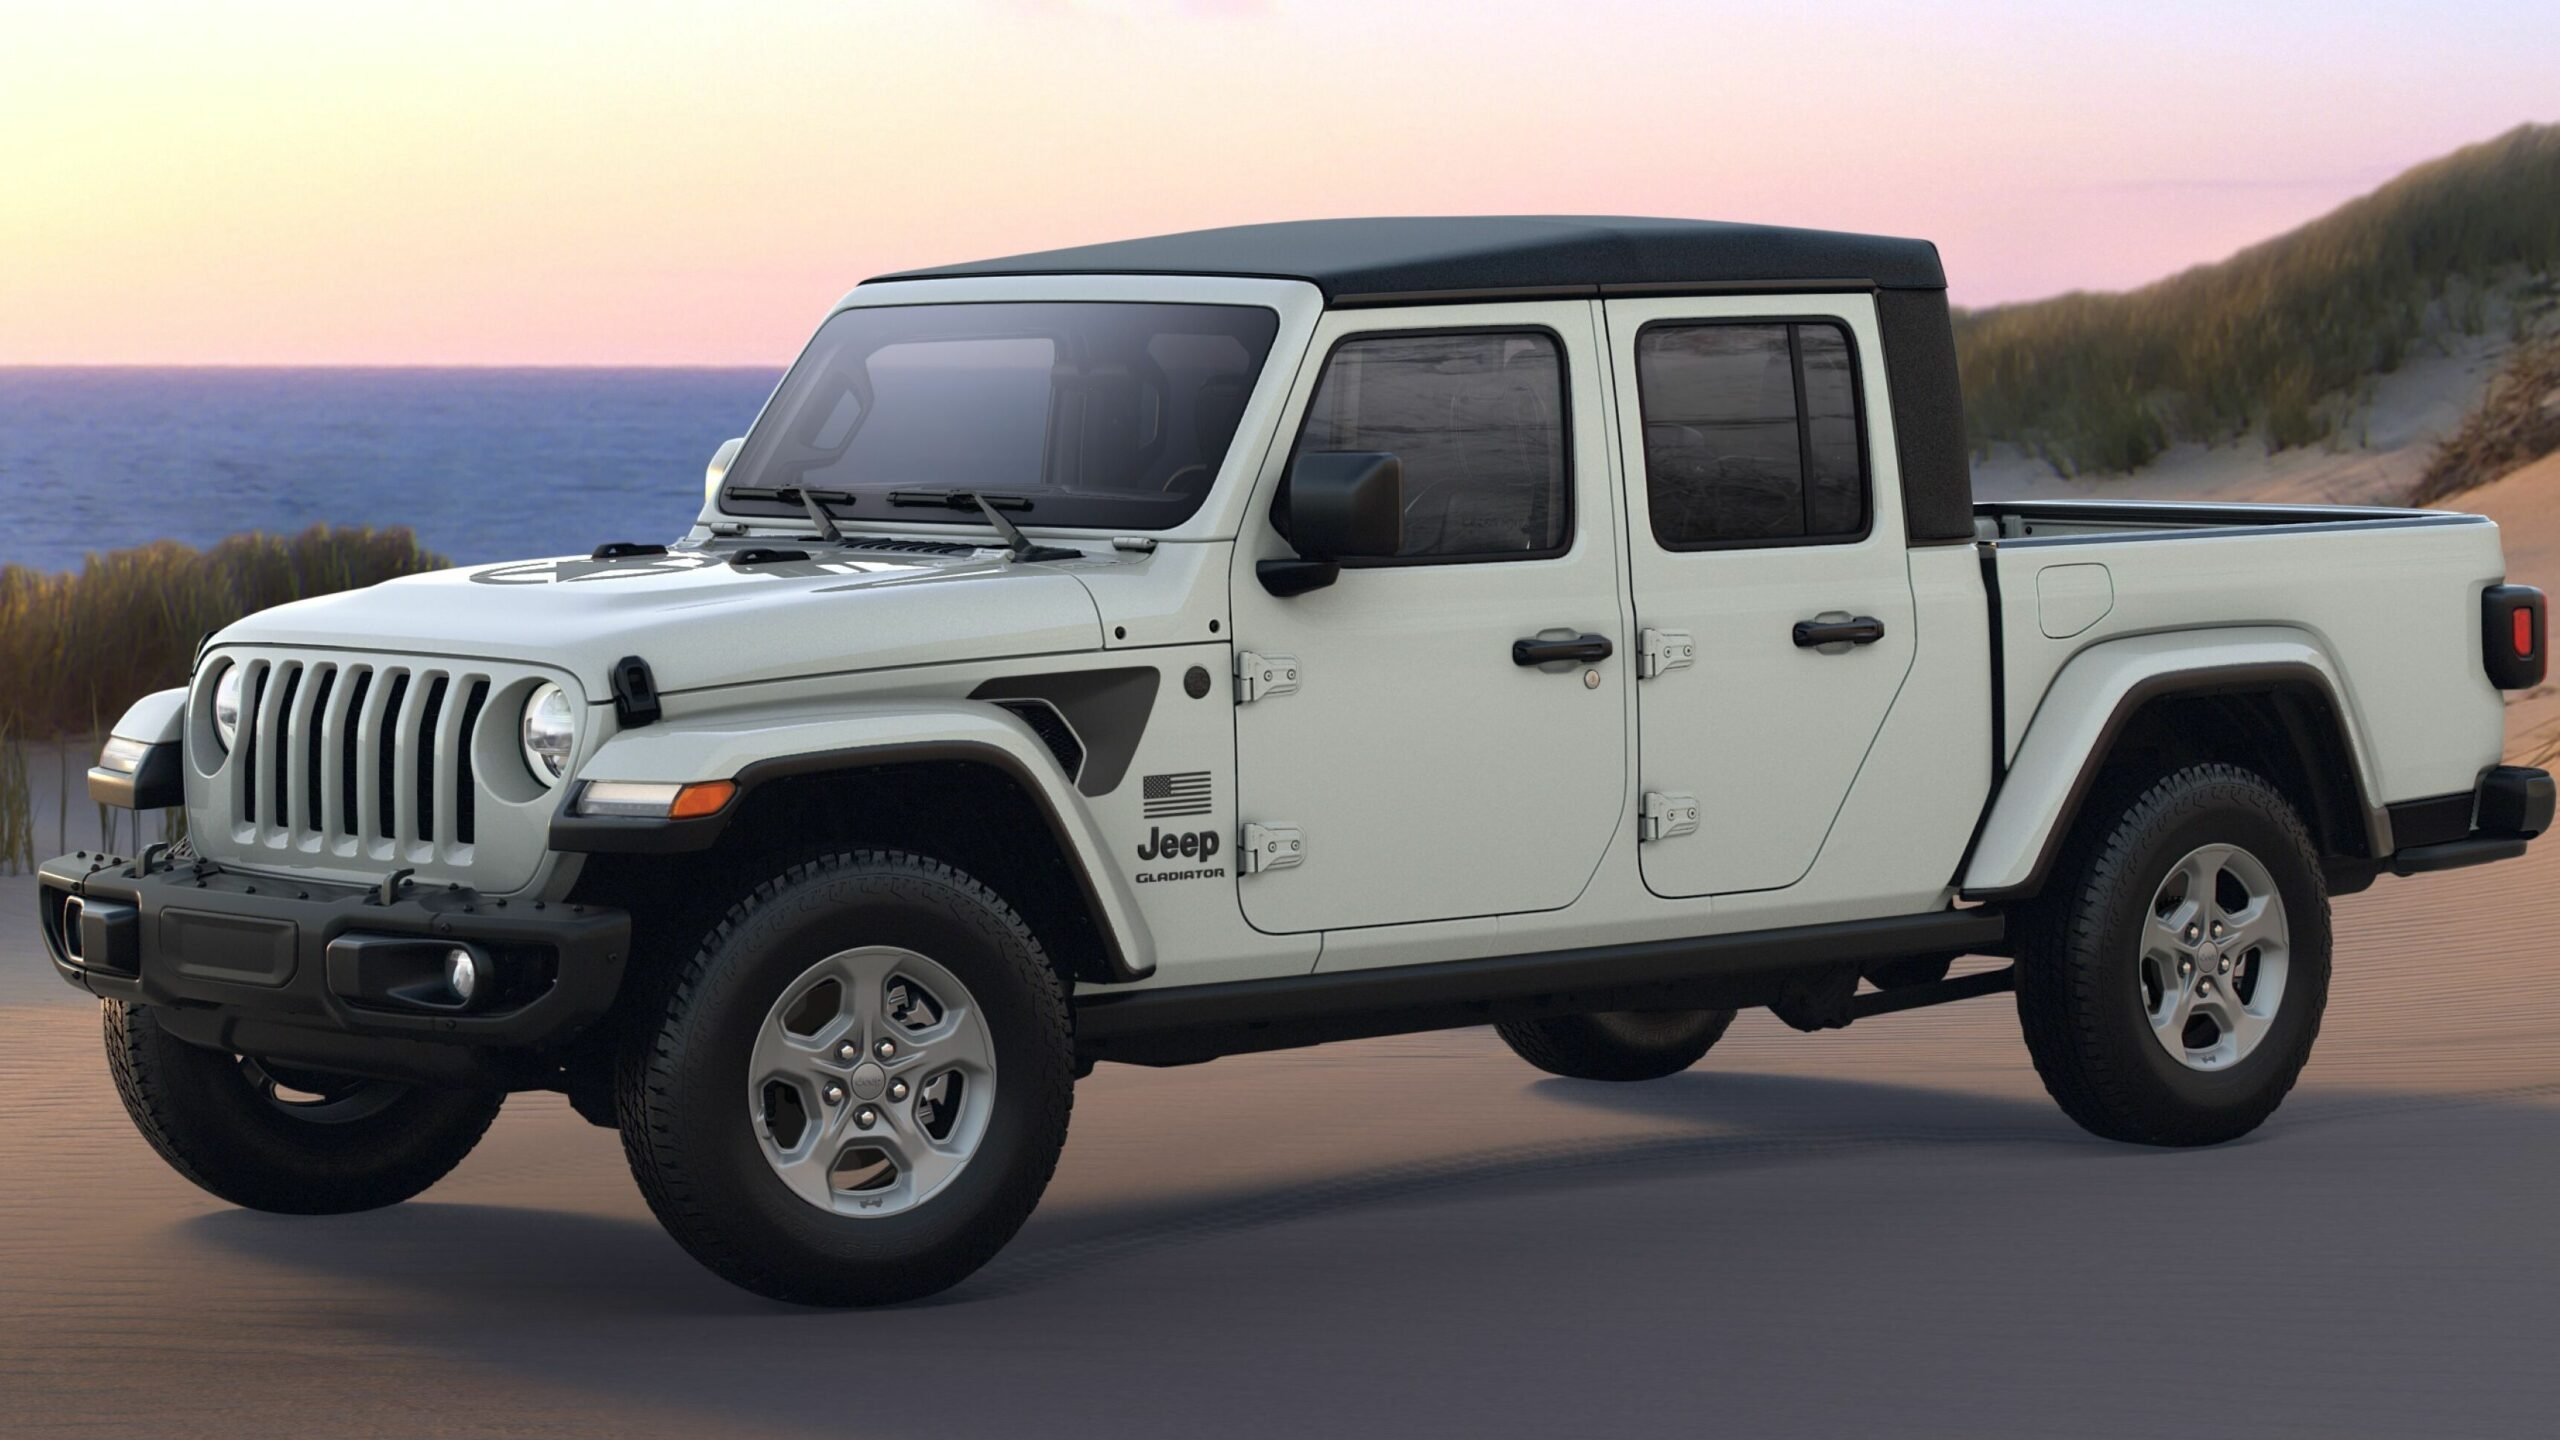 Jeep Gladiator Freedom Edition